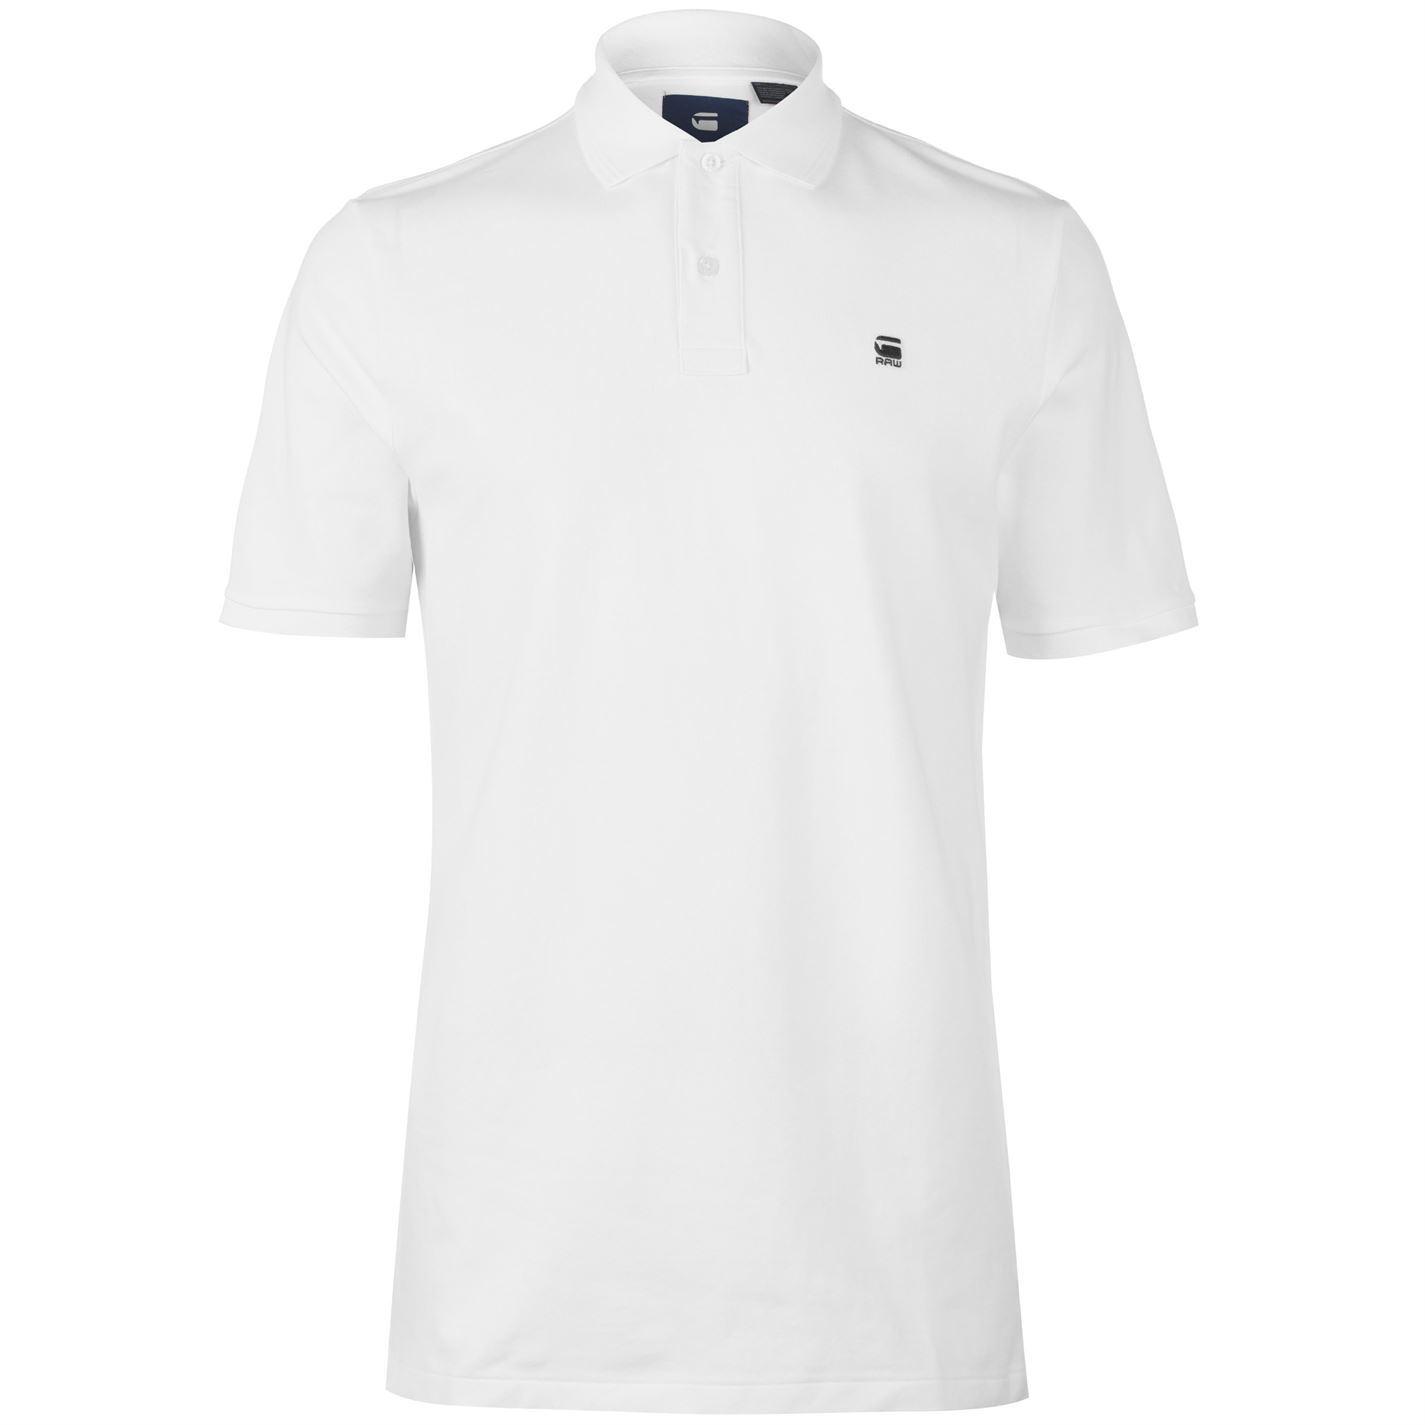 G Star Mens Raw Dunda Polo Shirt Classic Fit Tee Top Short Sleeve ... af087e6551